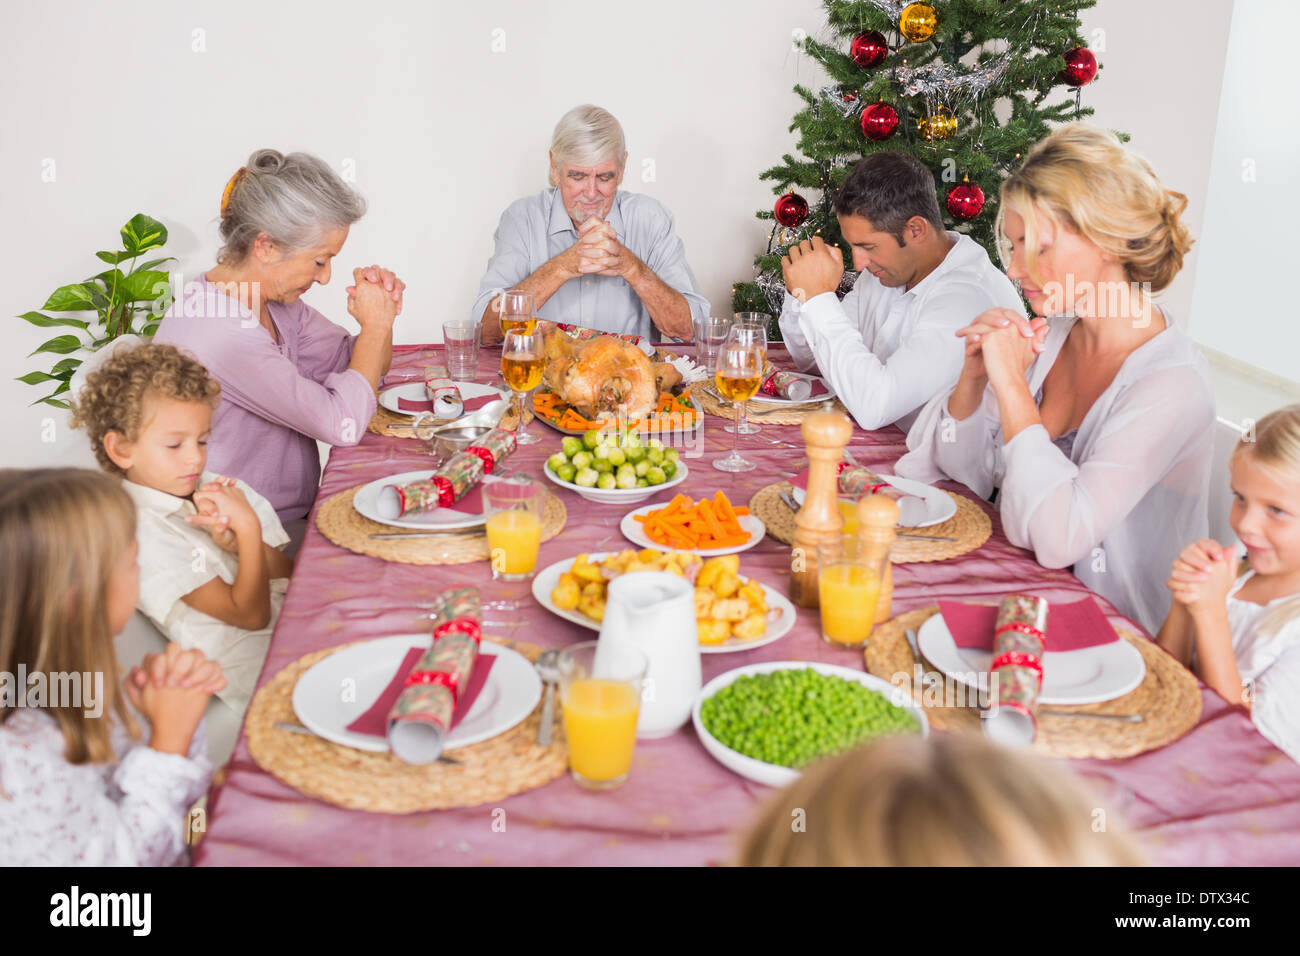 Family saying grace before christmas dinner - Stock Image